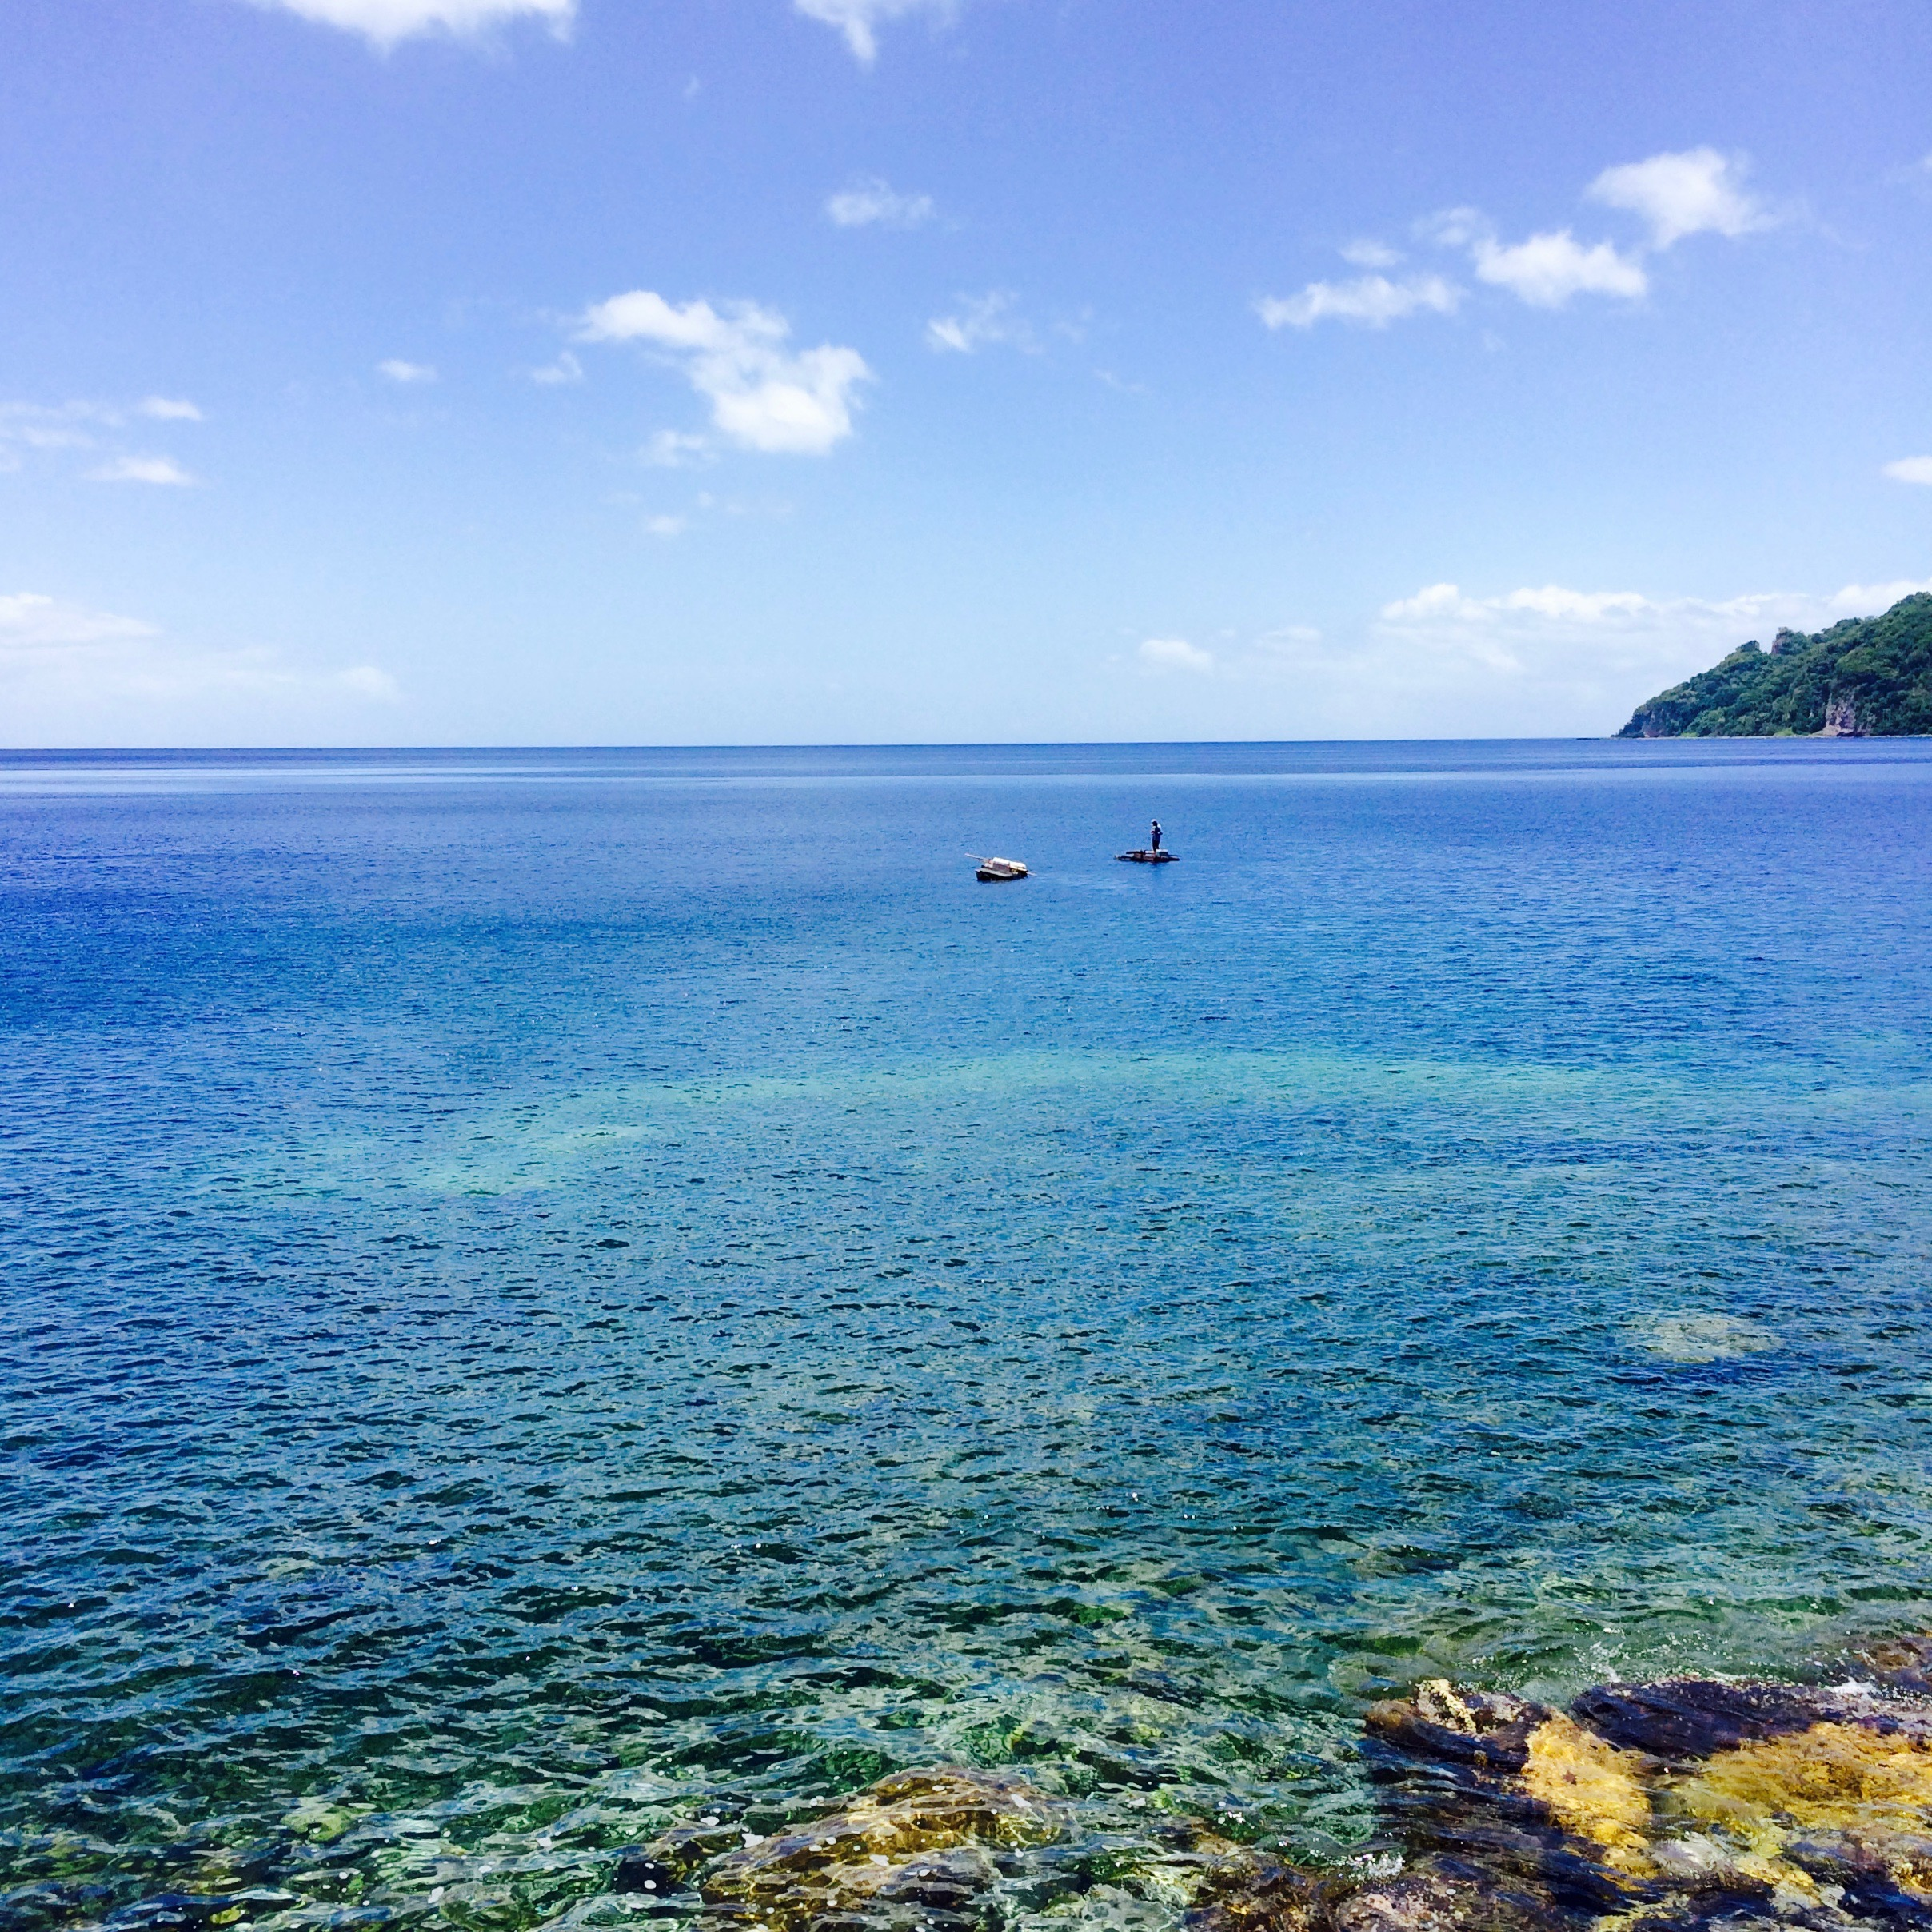 Eilandhoppen in de Caribbean